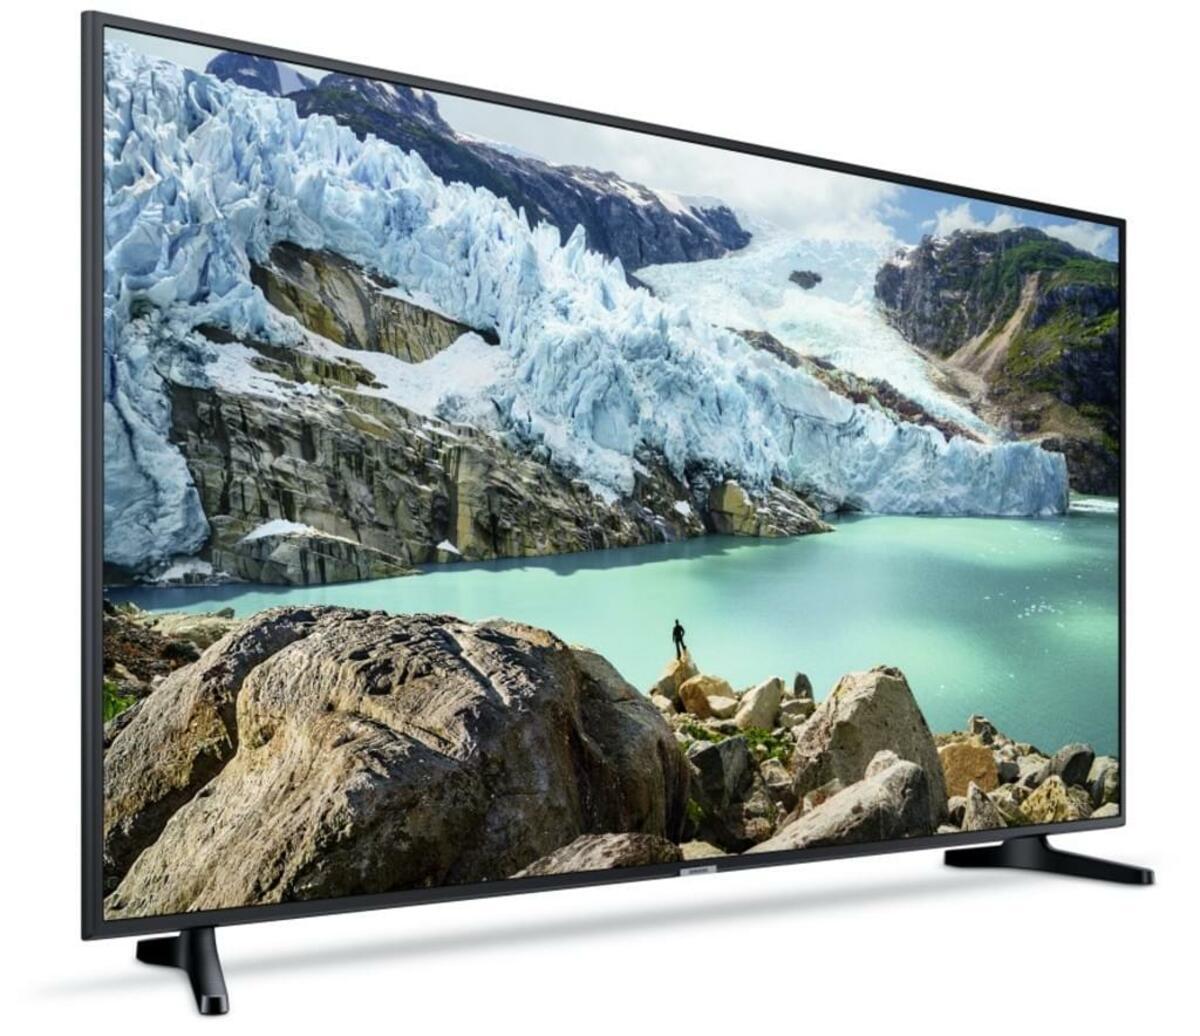 Bild 3 von Samsung 4K Ultra HD LED 138 cm (55 Zoll) 55RU7099 Smart TV, Triple Tuner, HDR10+